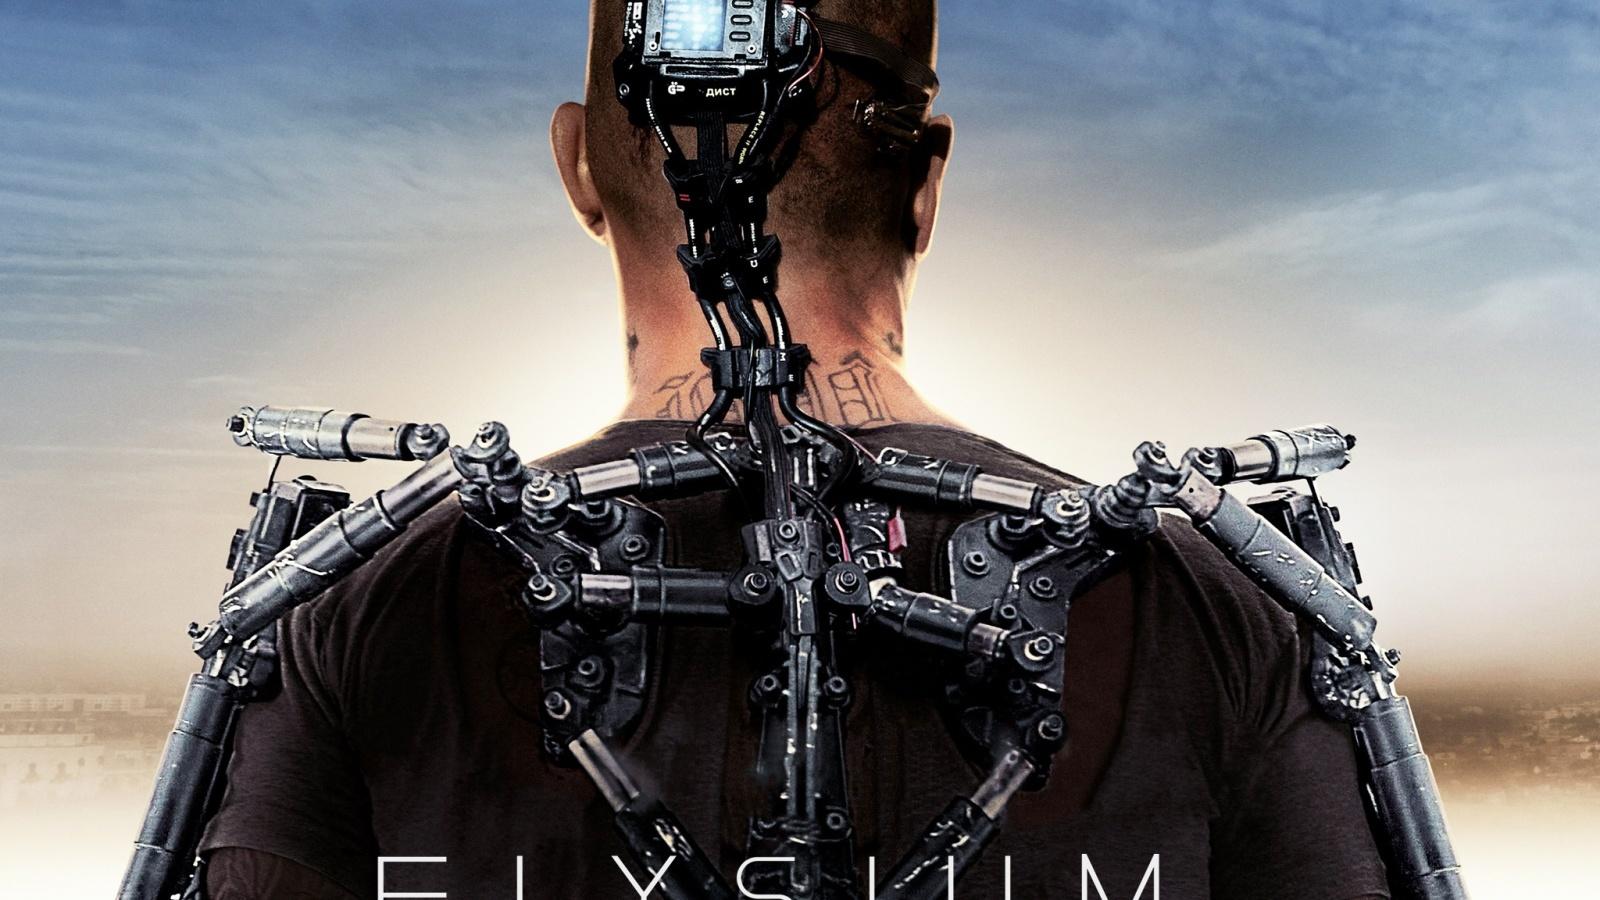 Neill Blomkamp teleurgesteld over 'Elysium'